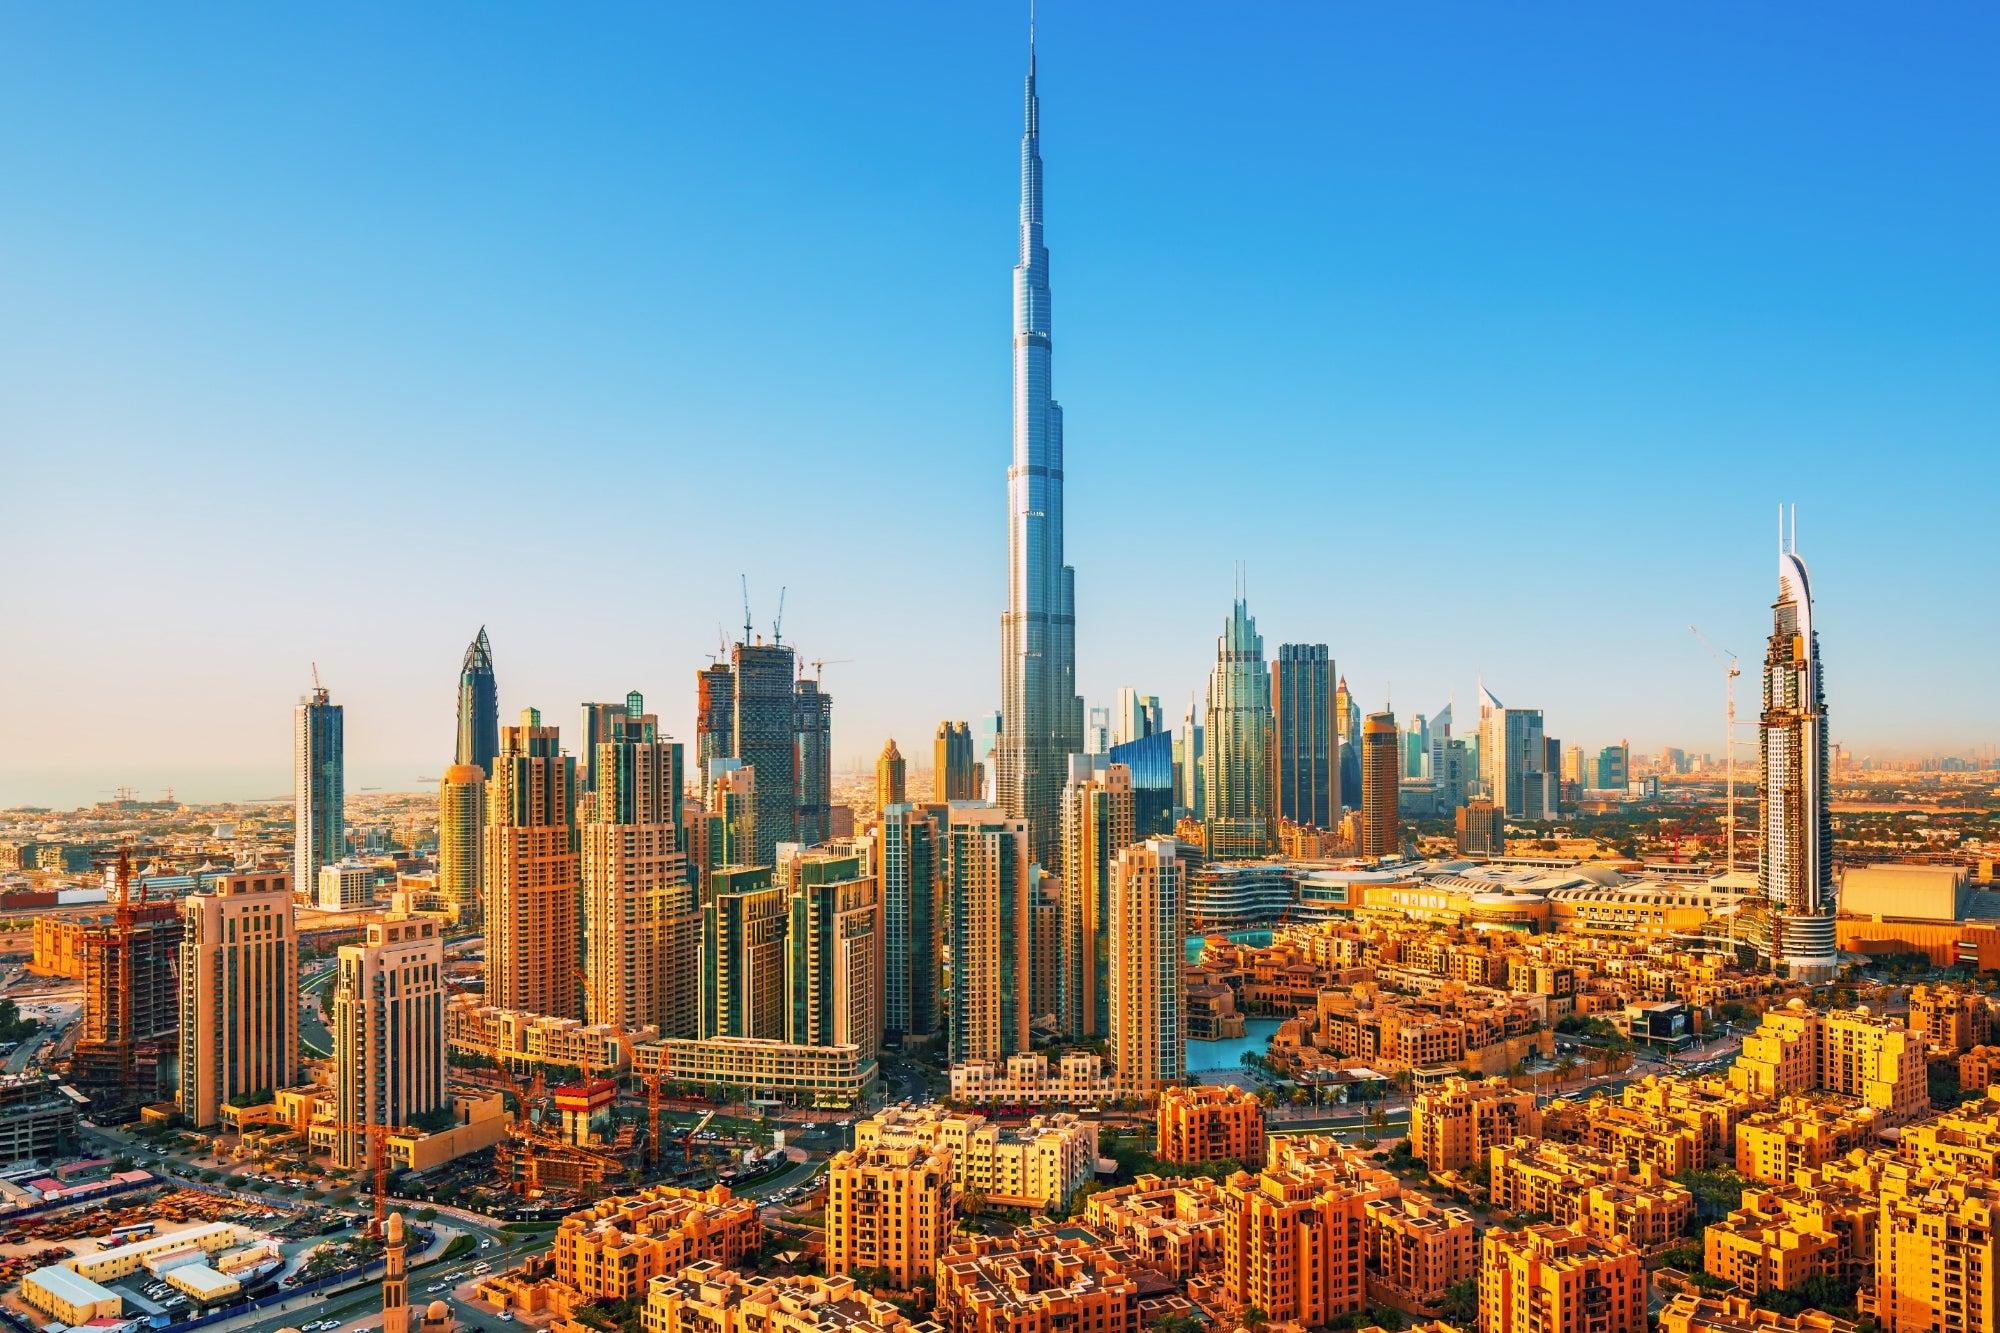 Dubai Startup Hub And Dtec Release Report Highlighting Attractiveness Of Dubai's Startup Ecosystem